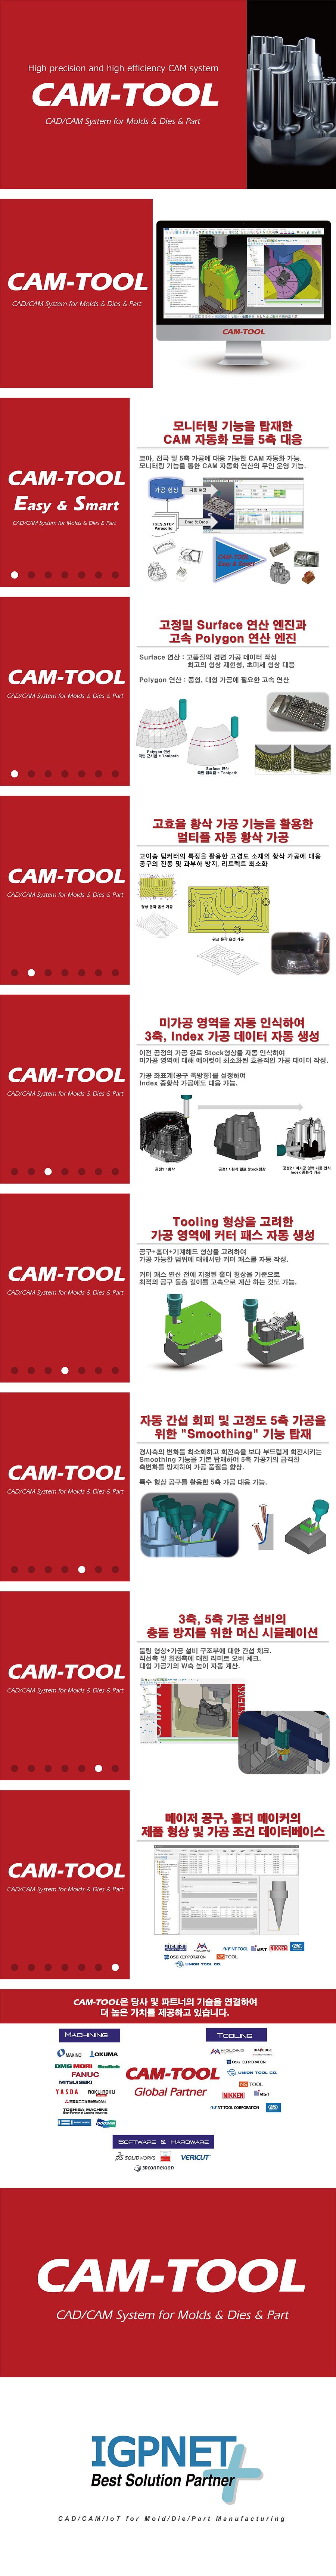 CAM-TOOL.jpg